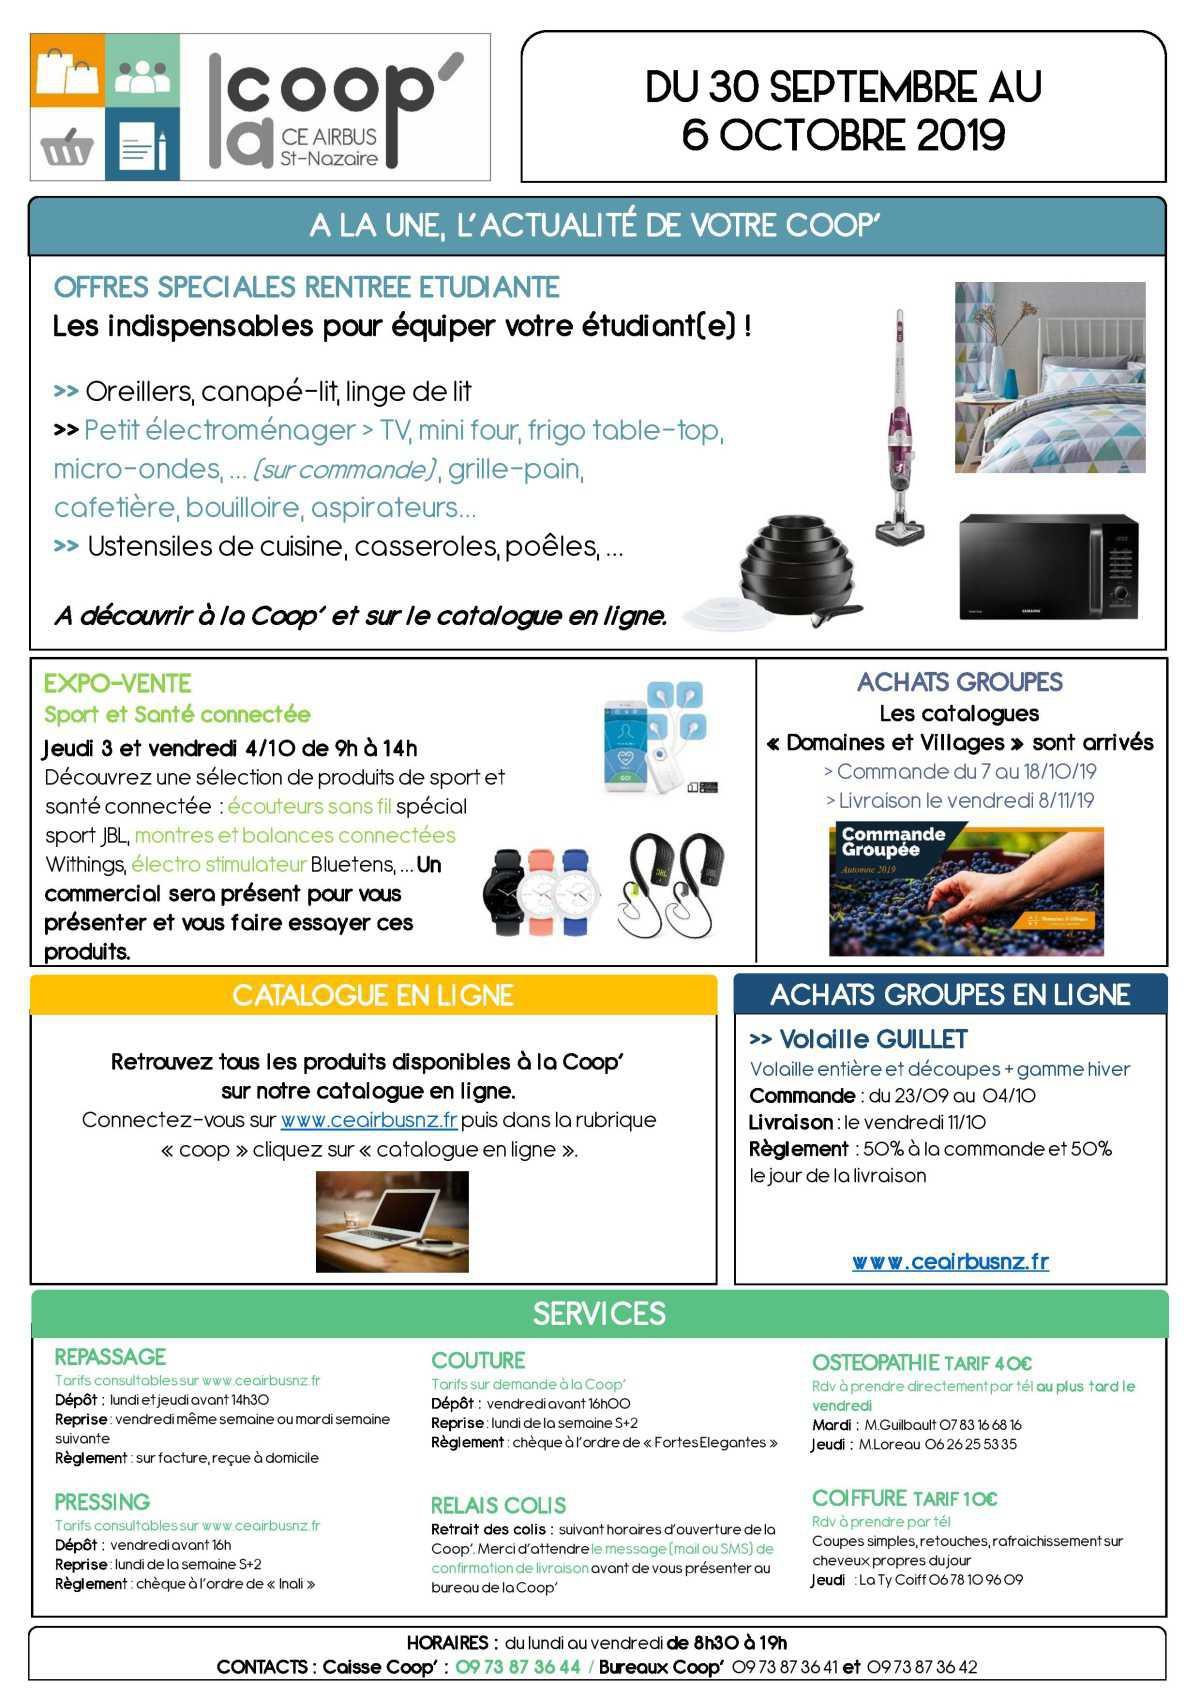 Infos CE / COOP semaine 40